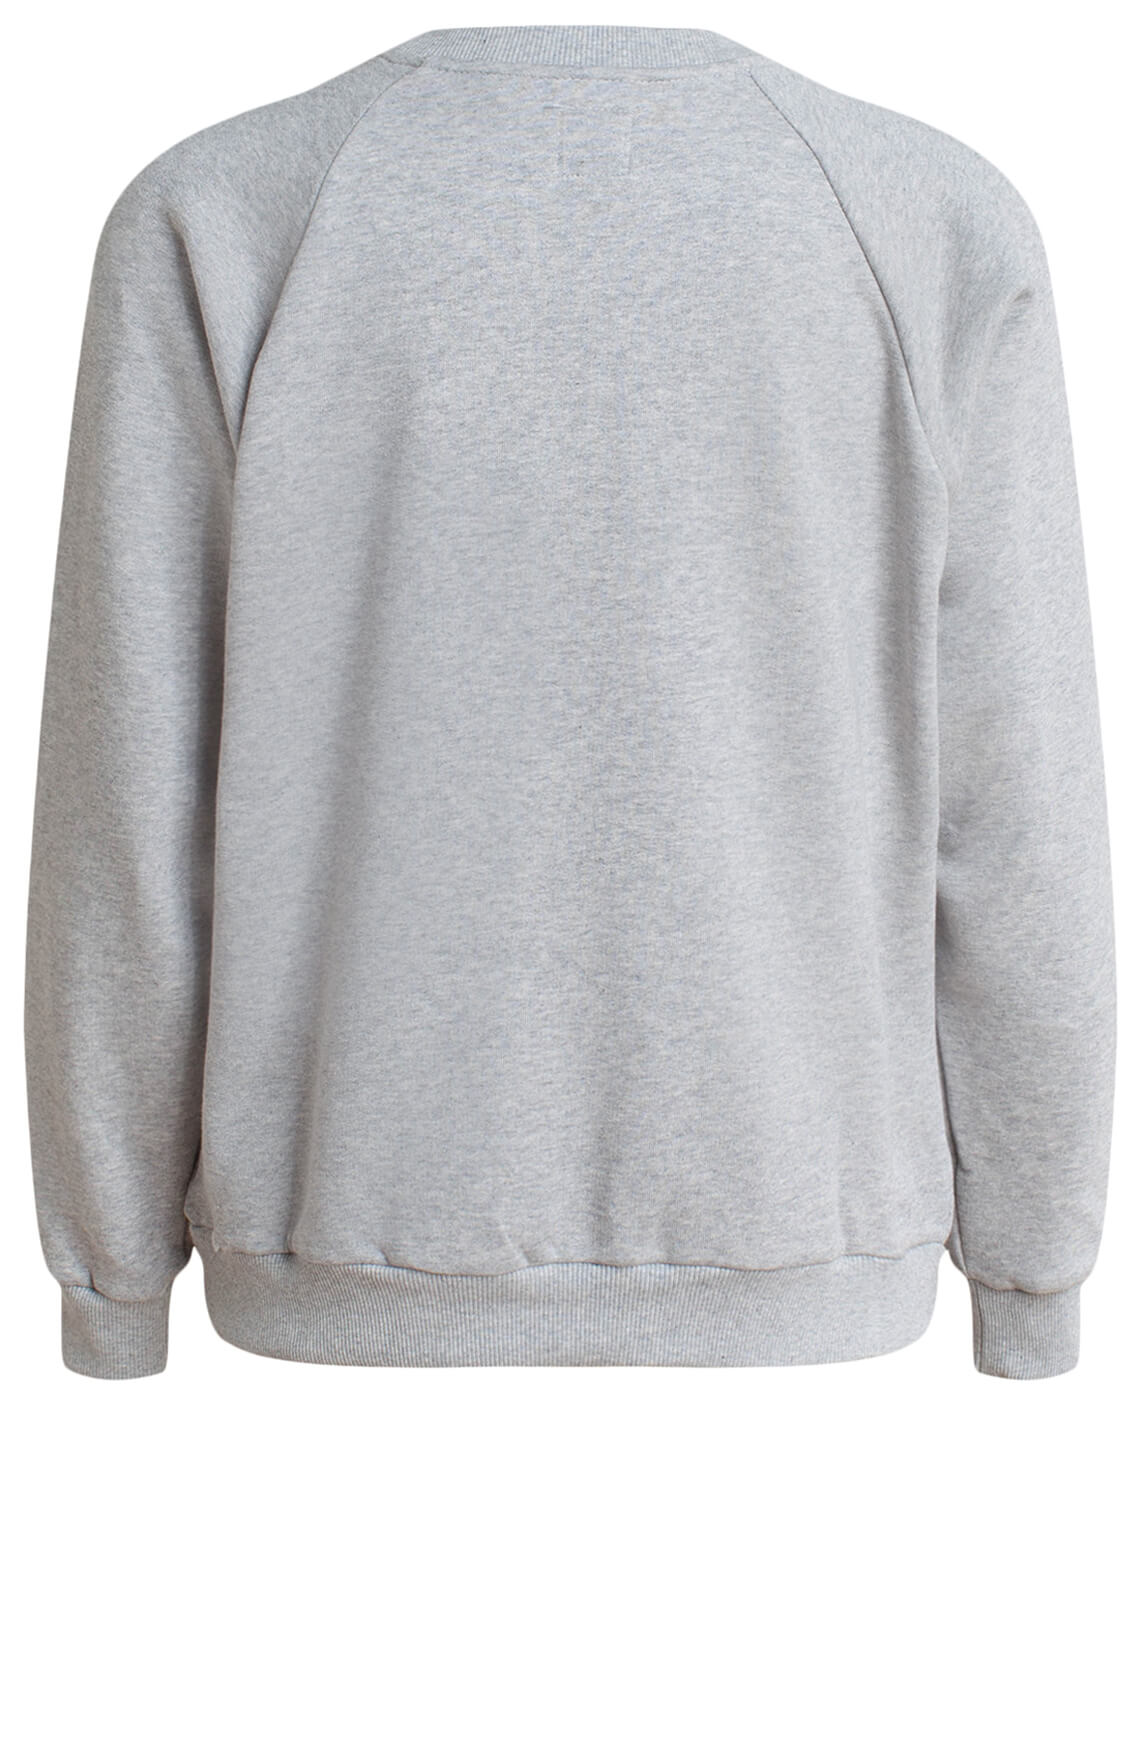 Lois Dames Varsity sweater Grijs